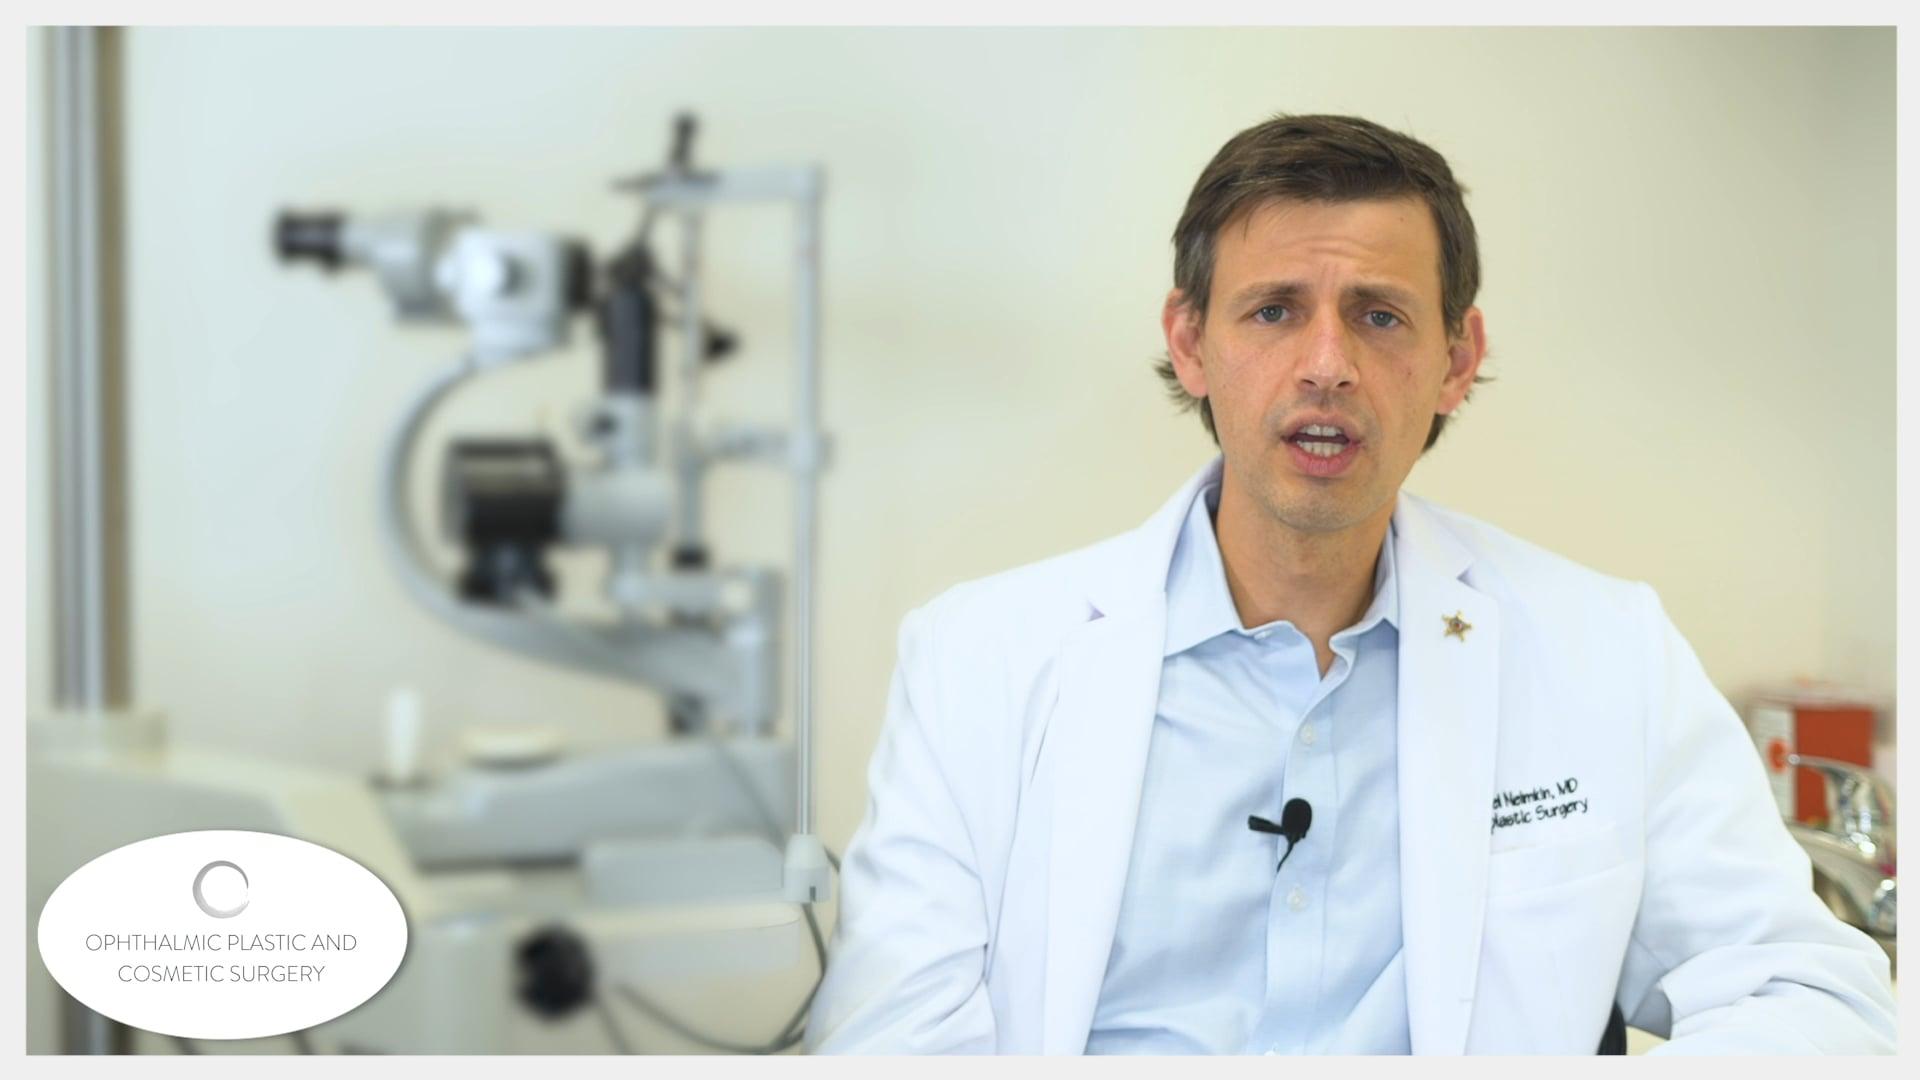 Plastic Surgeon Service Video